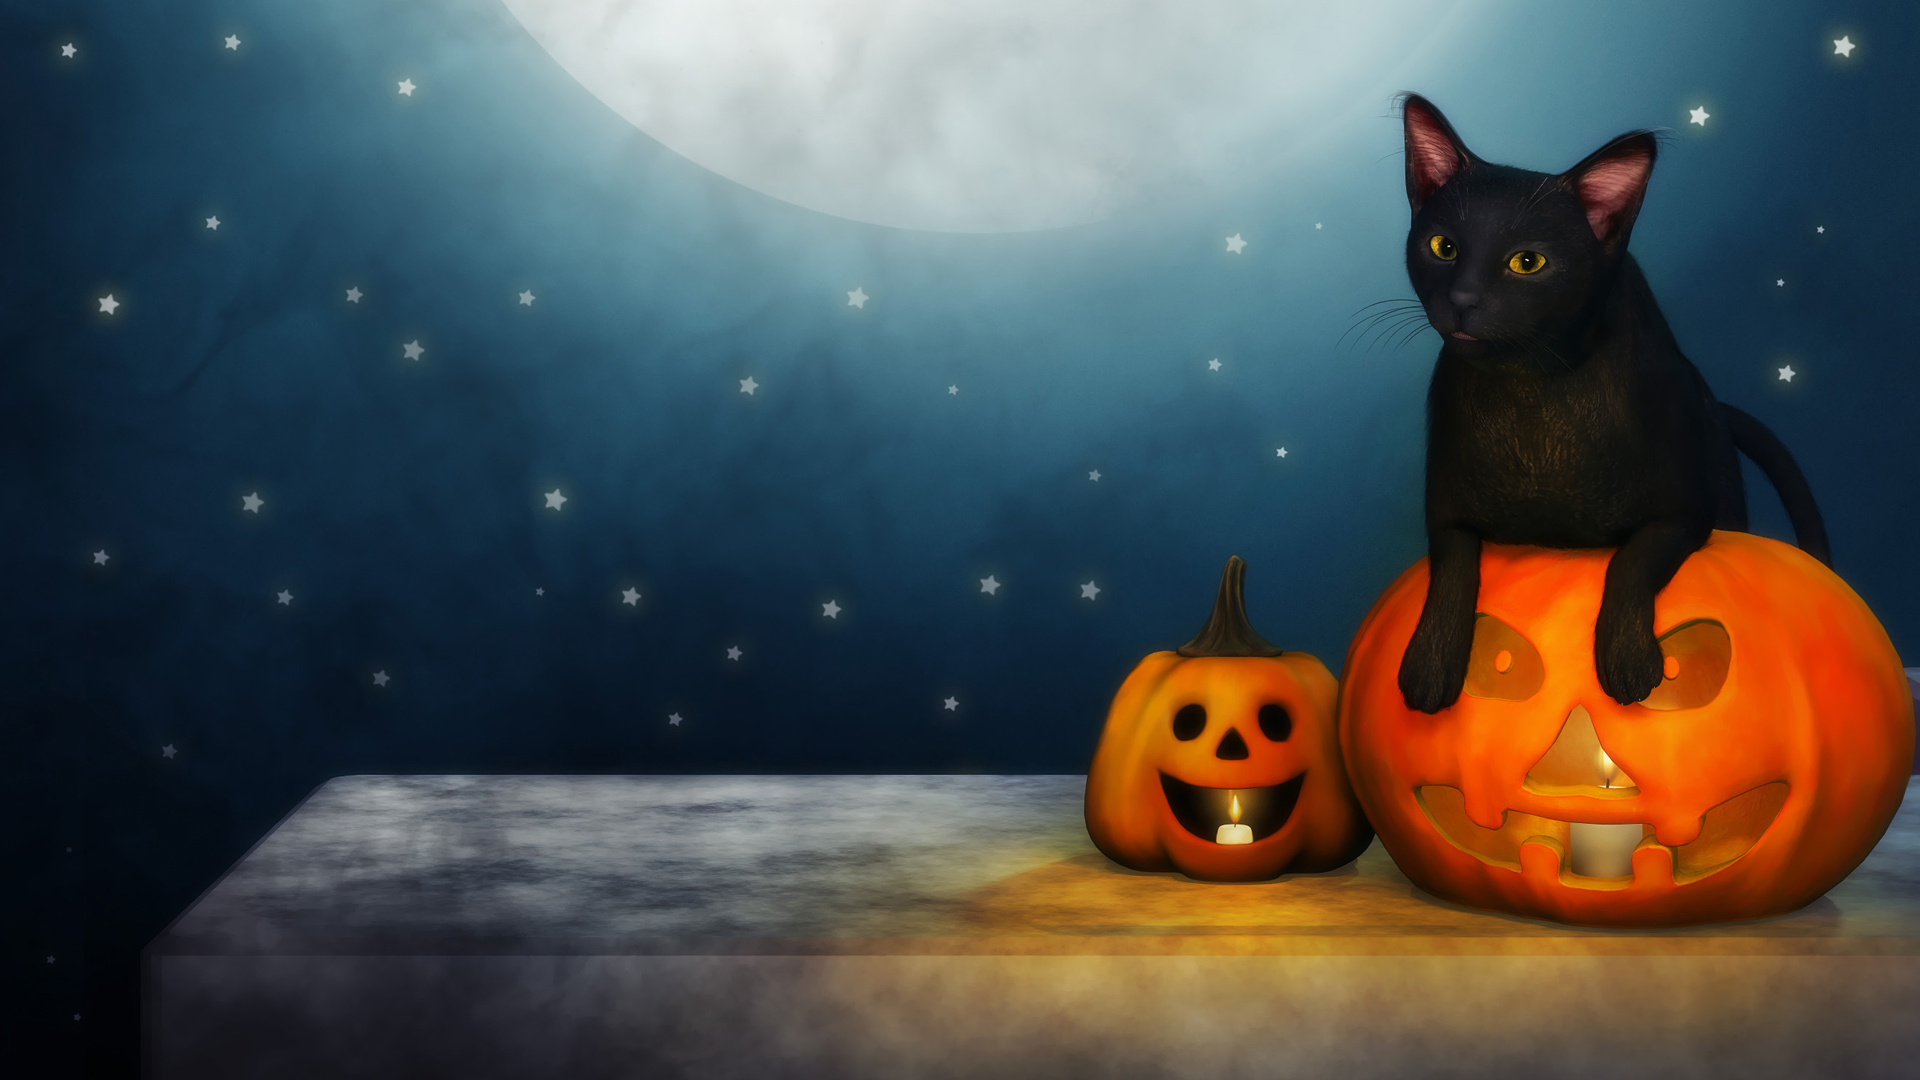 House Design Games For Pc Free Download 1920x1080 Hd Halloween Wallpaper Wallpapersafari